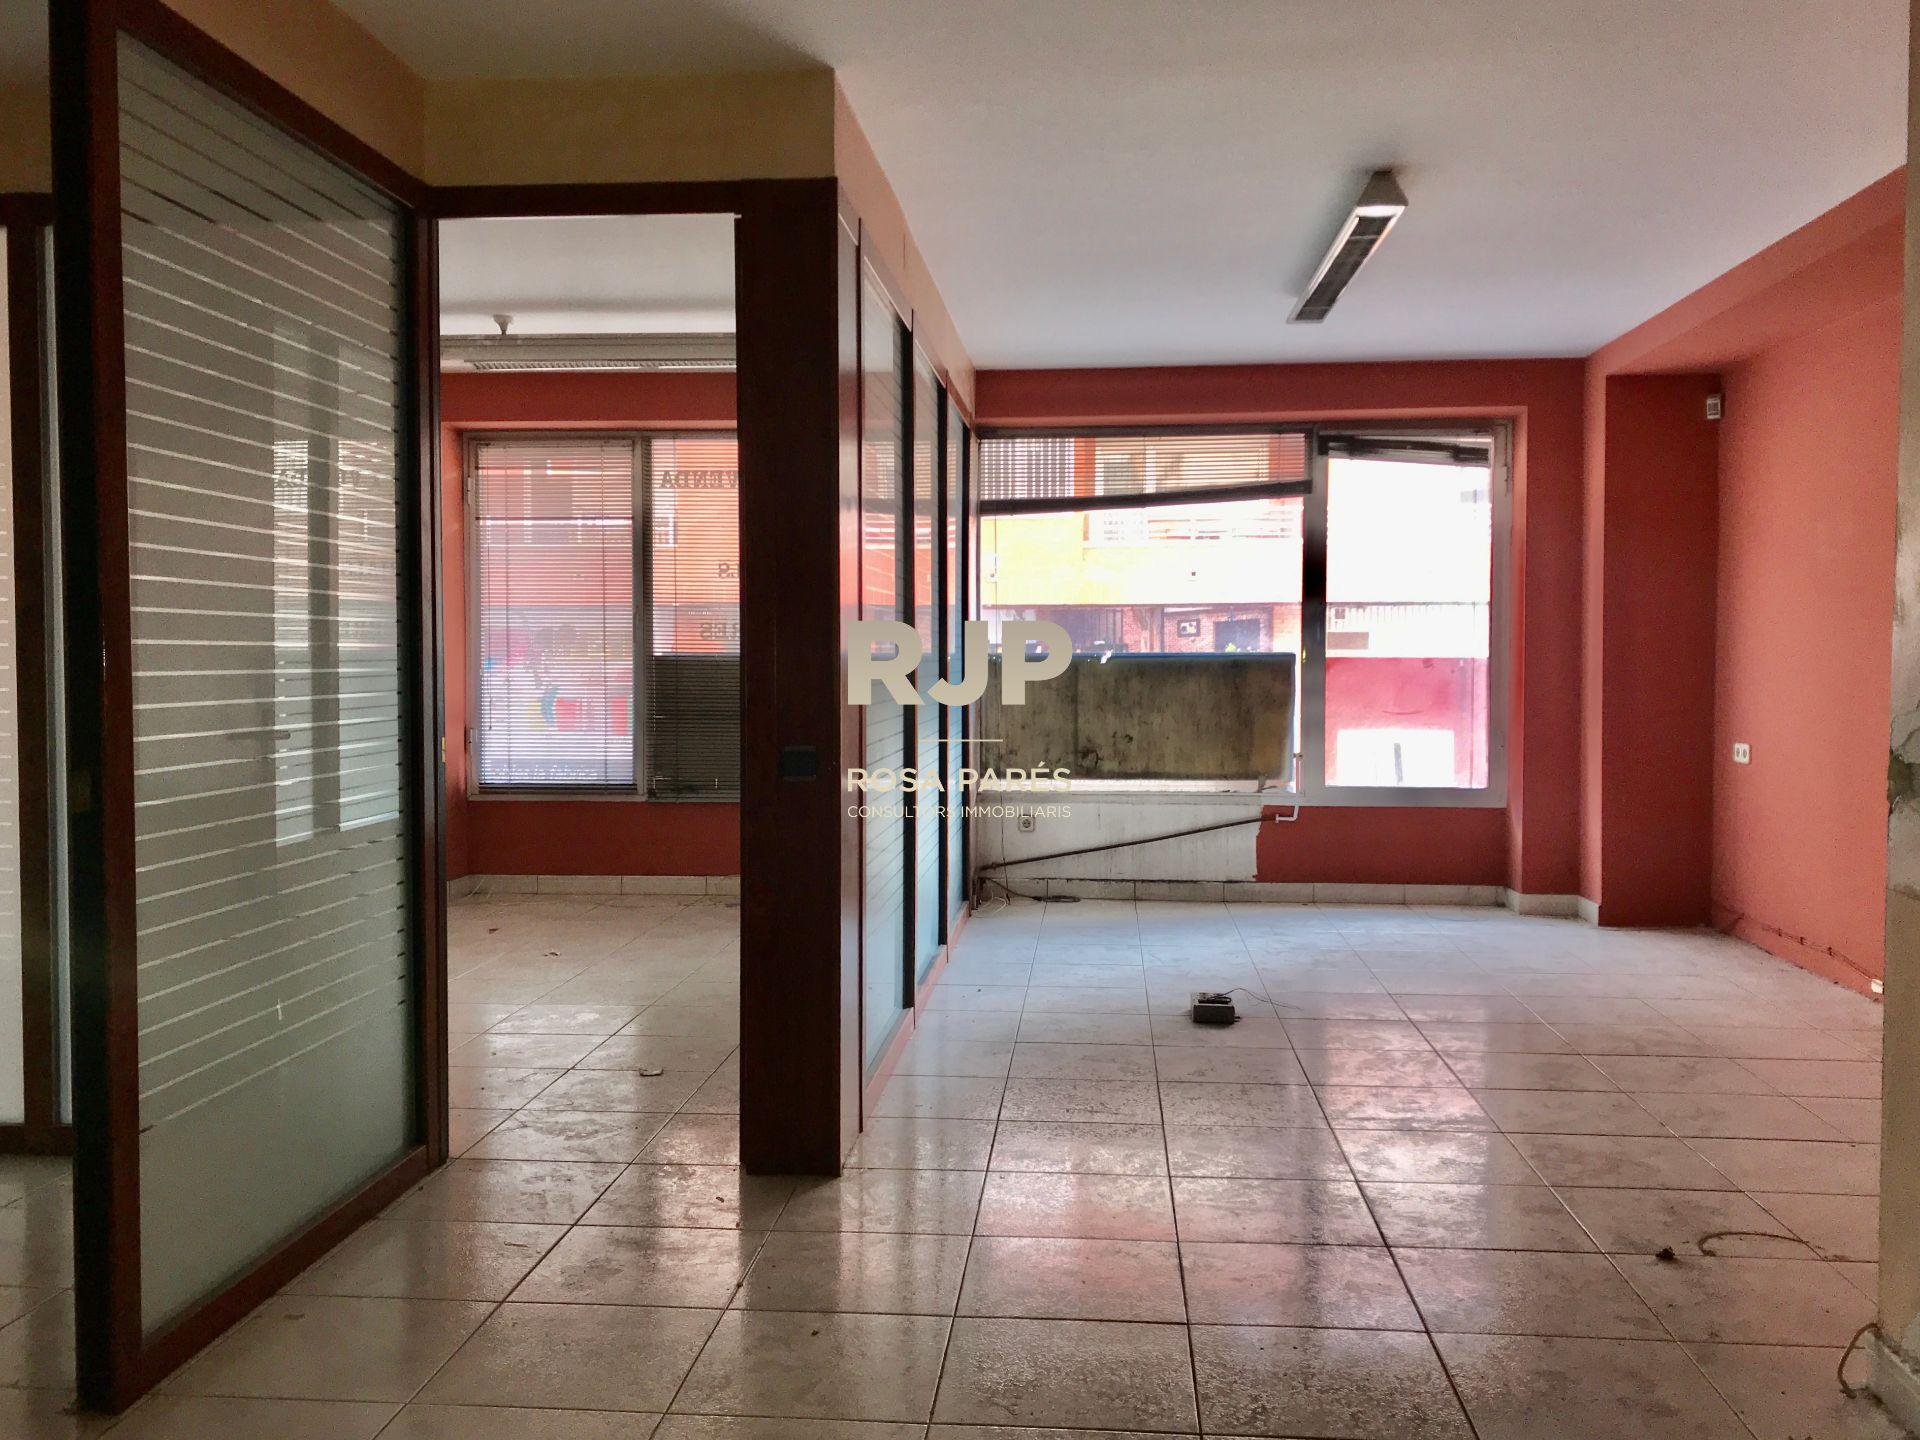 Local comercial en Vic, CRA DE BARCELONA, alquiler